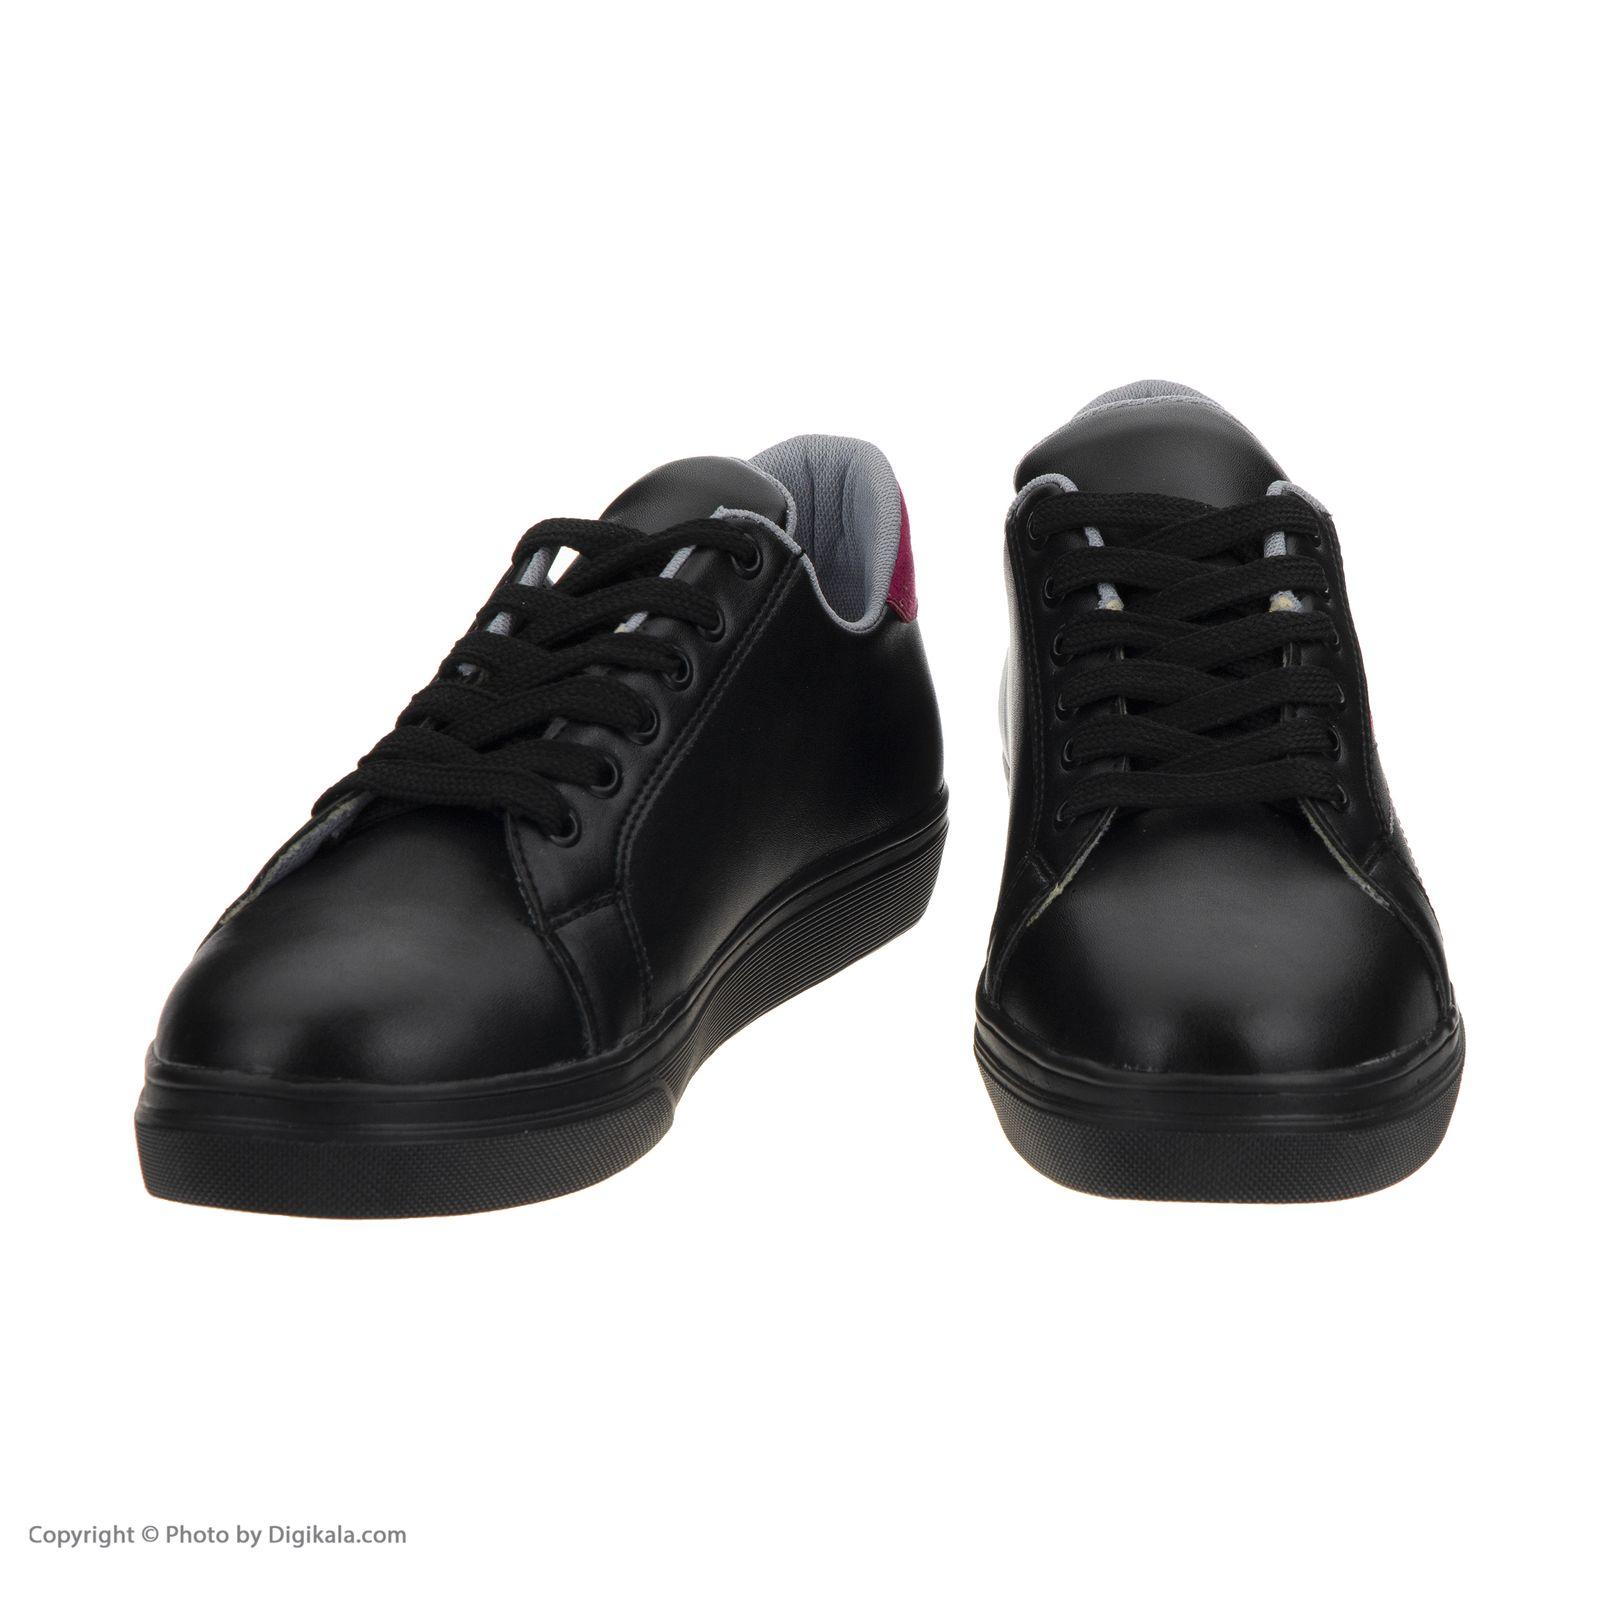 کفش روزمره زنانه مدل 4023 -  - 6